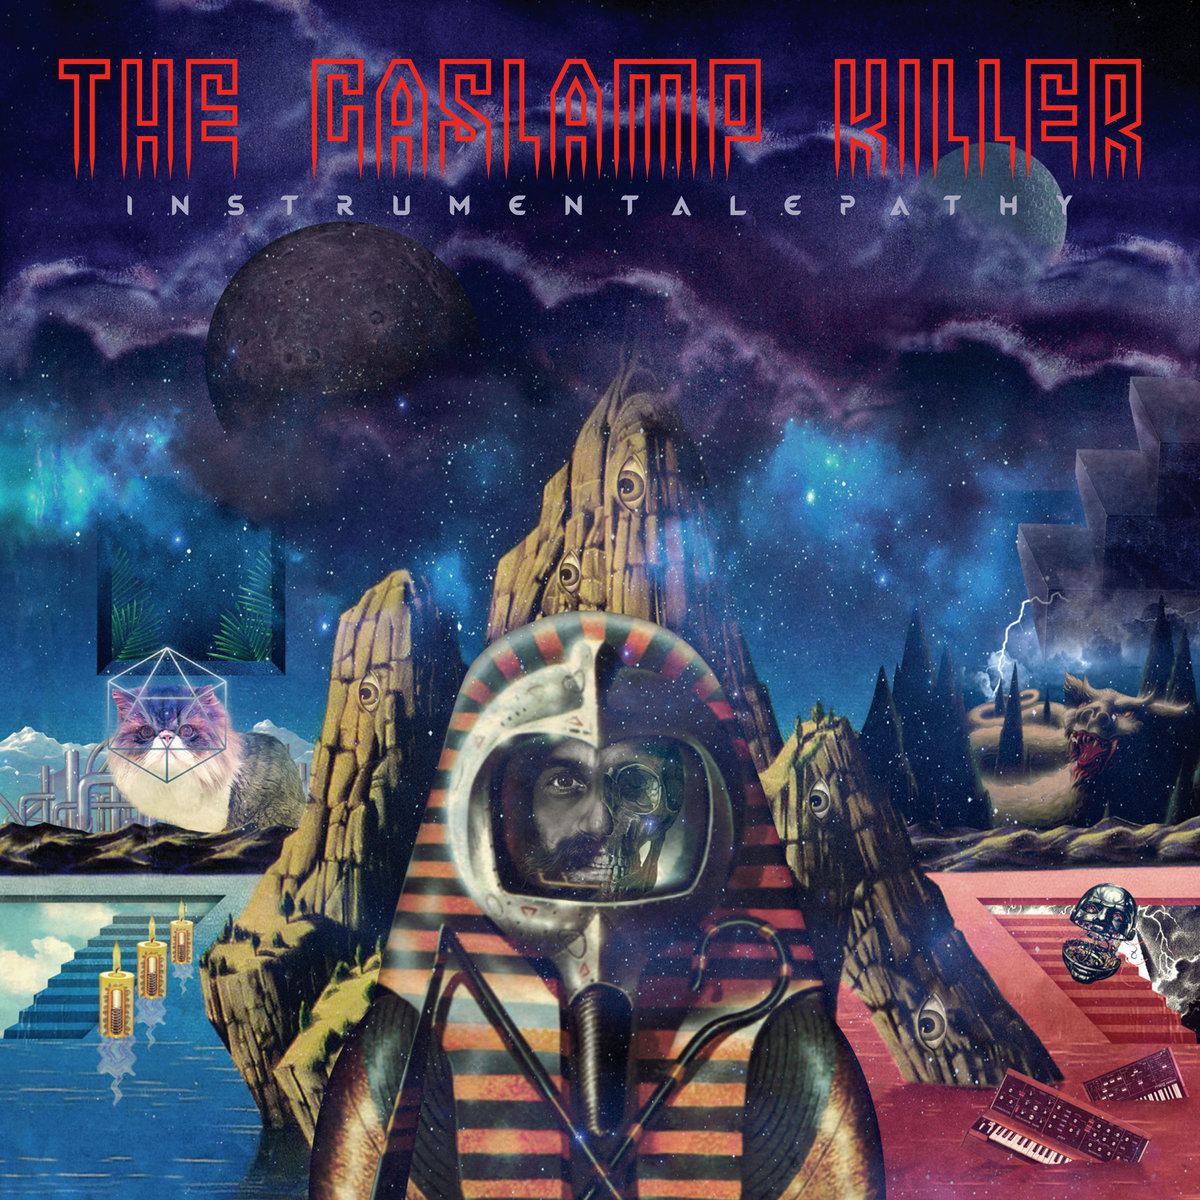 THE GASLAMP KILLER - INSTRUMENTALEPATHY (CUSS RECORDS, 2016)